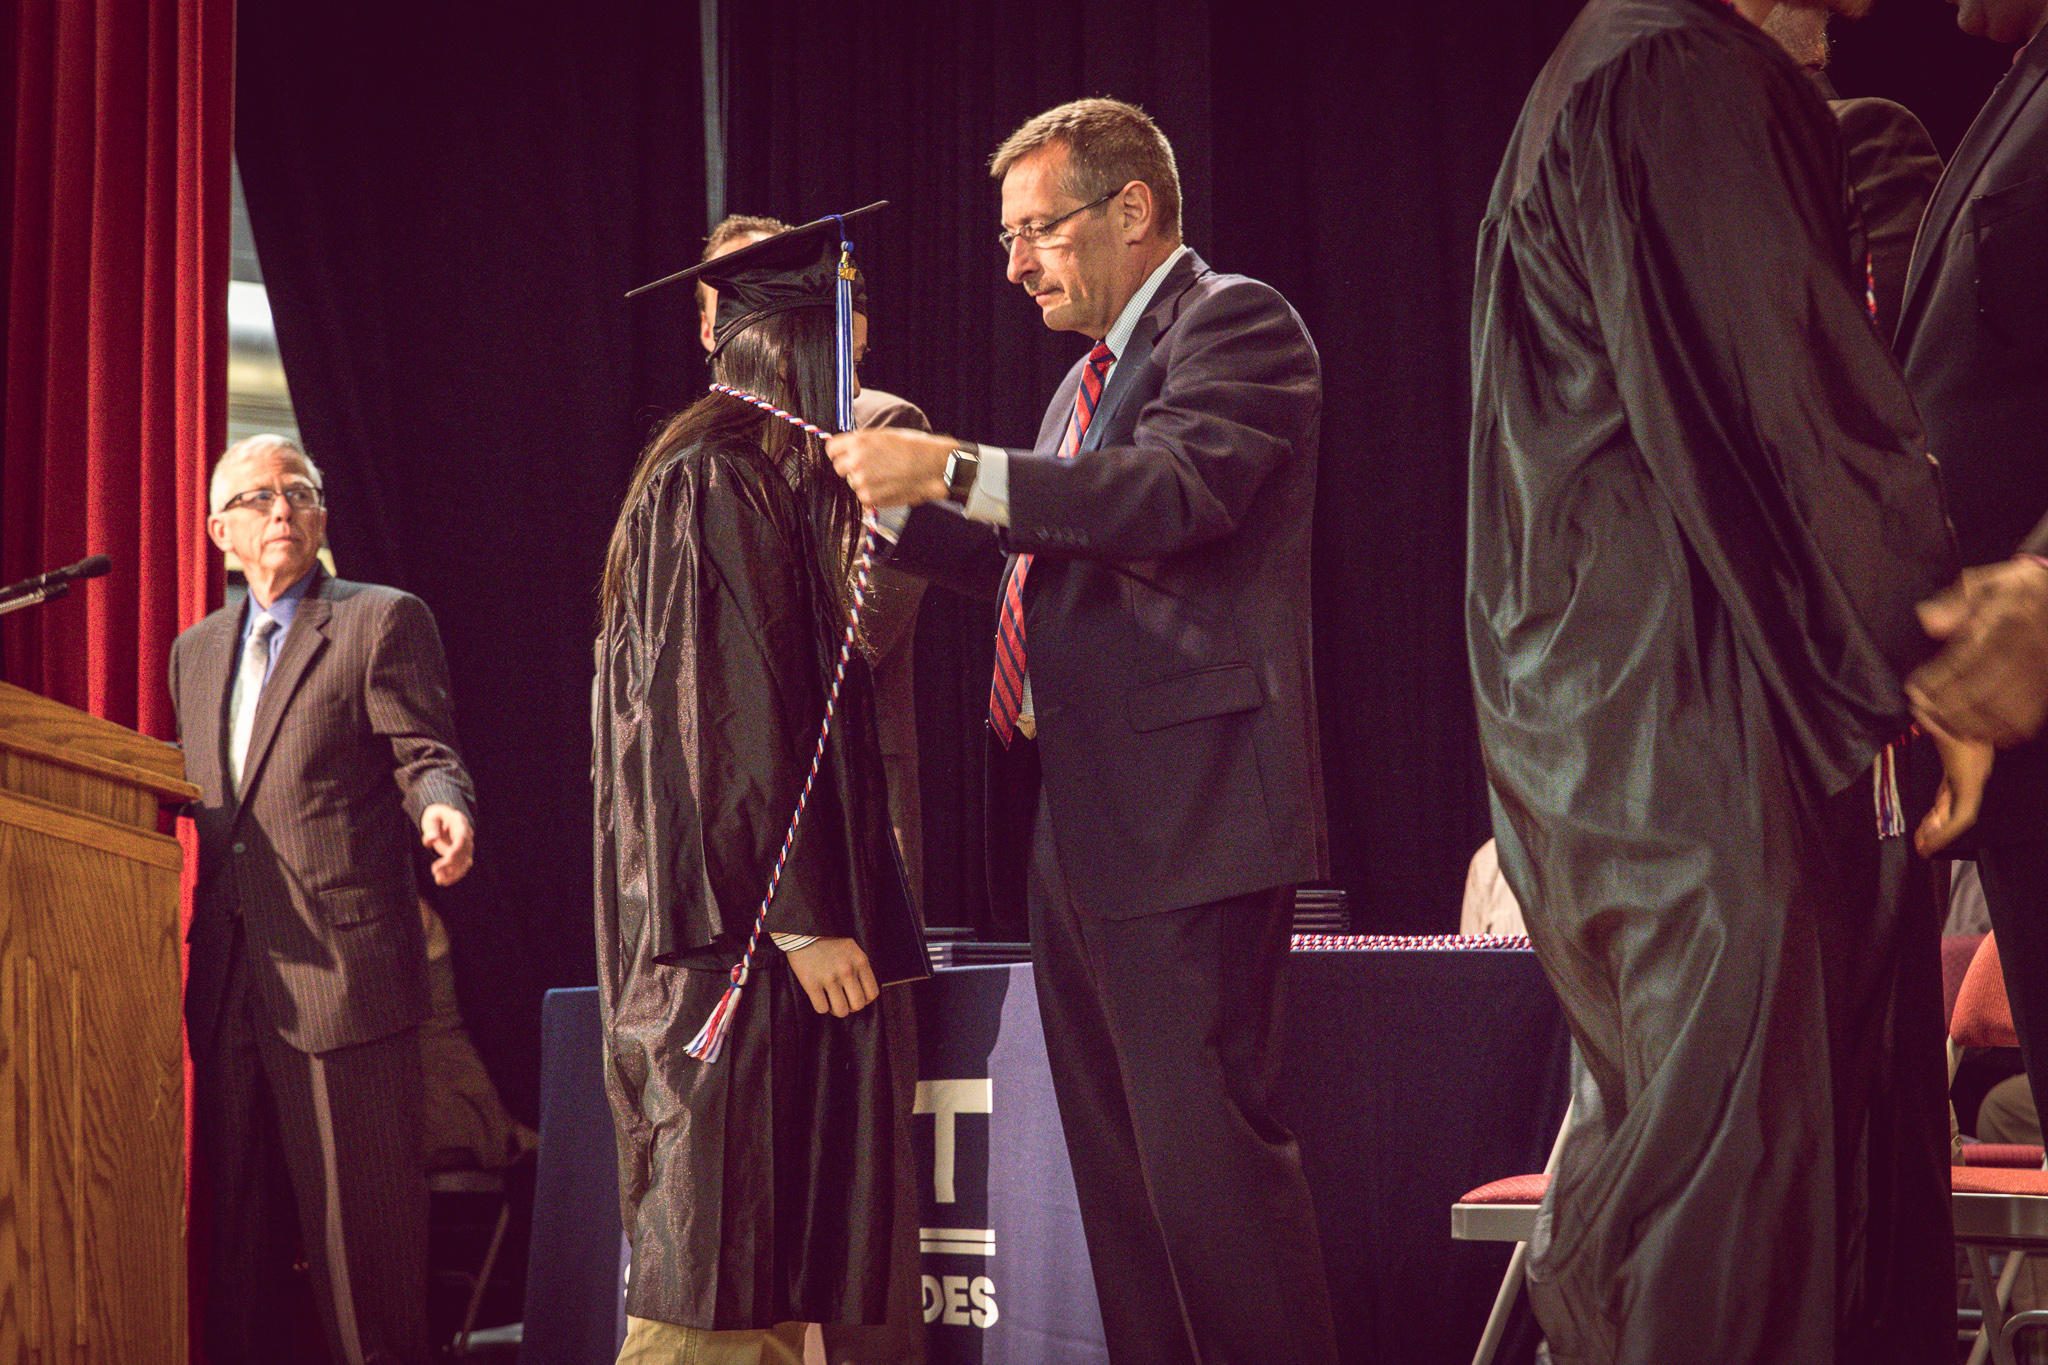 ncst_fall_2017_graduation-93.jpg